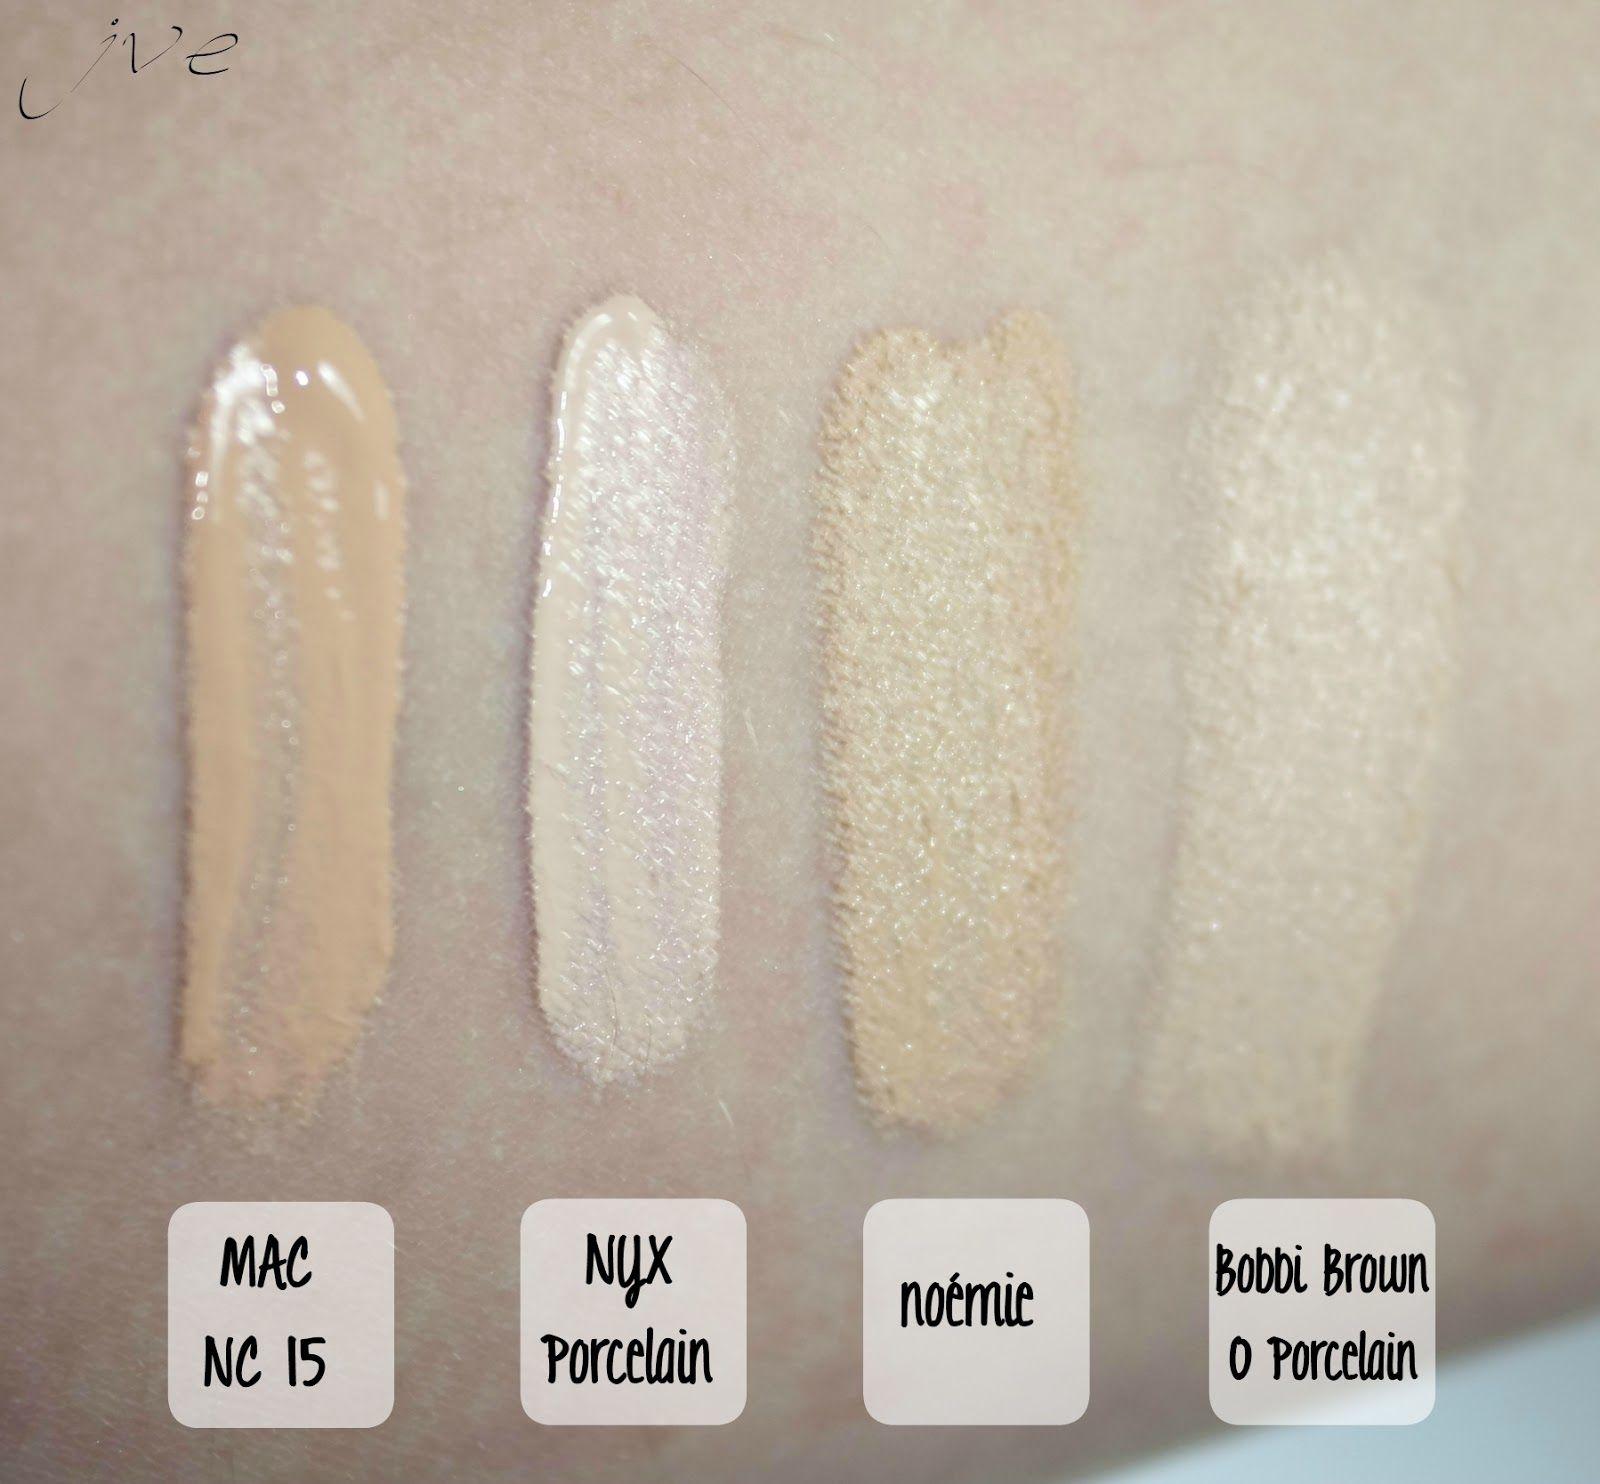 Mac Nc15 Studio Finish Concealer Vs Nyx Porcelain Full